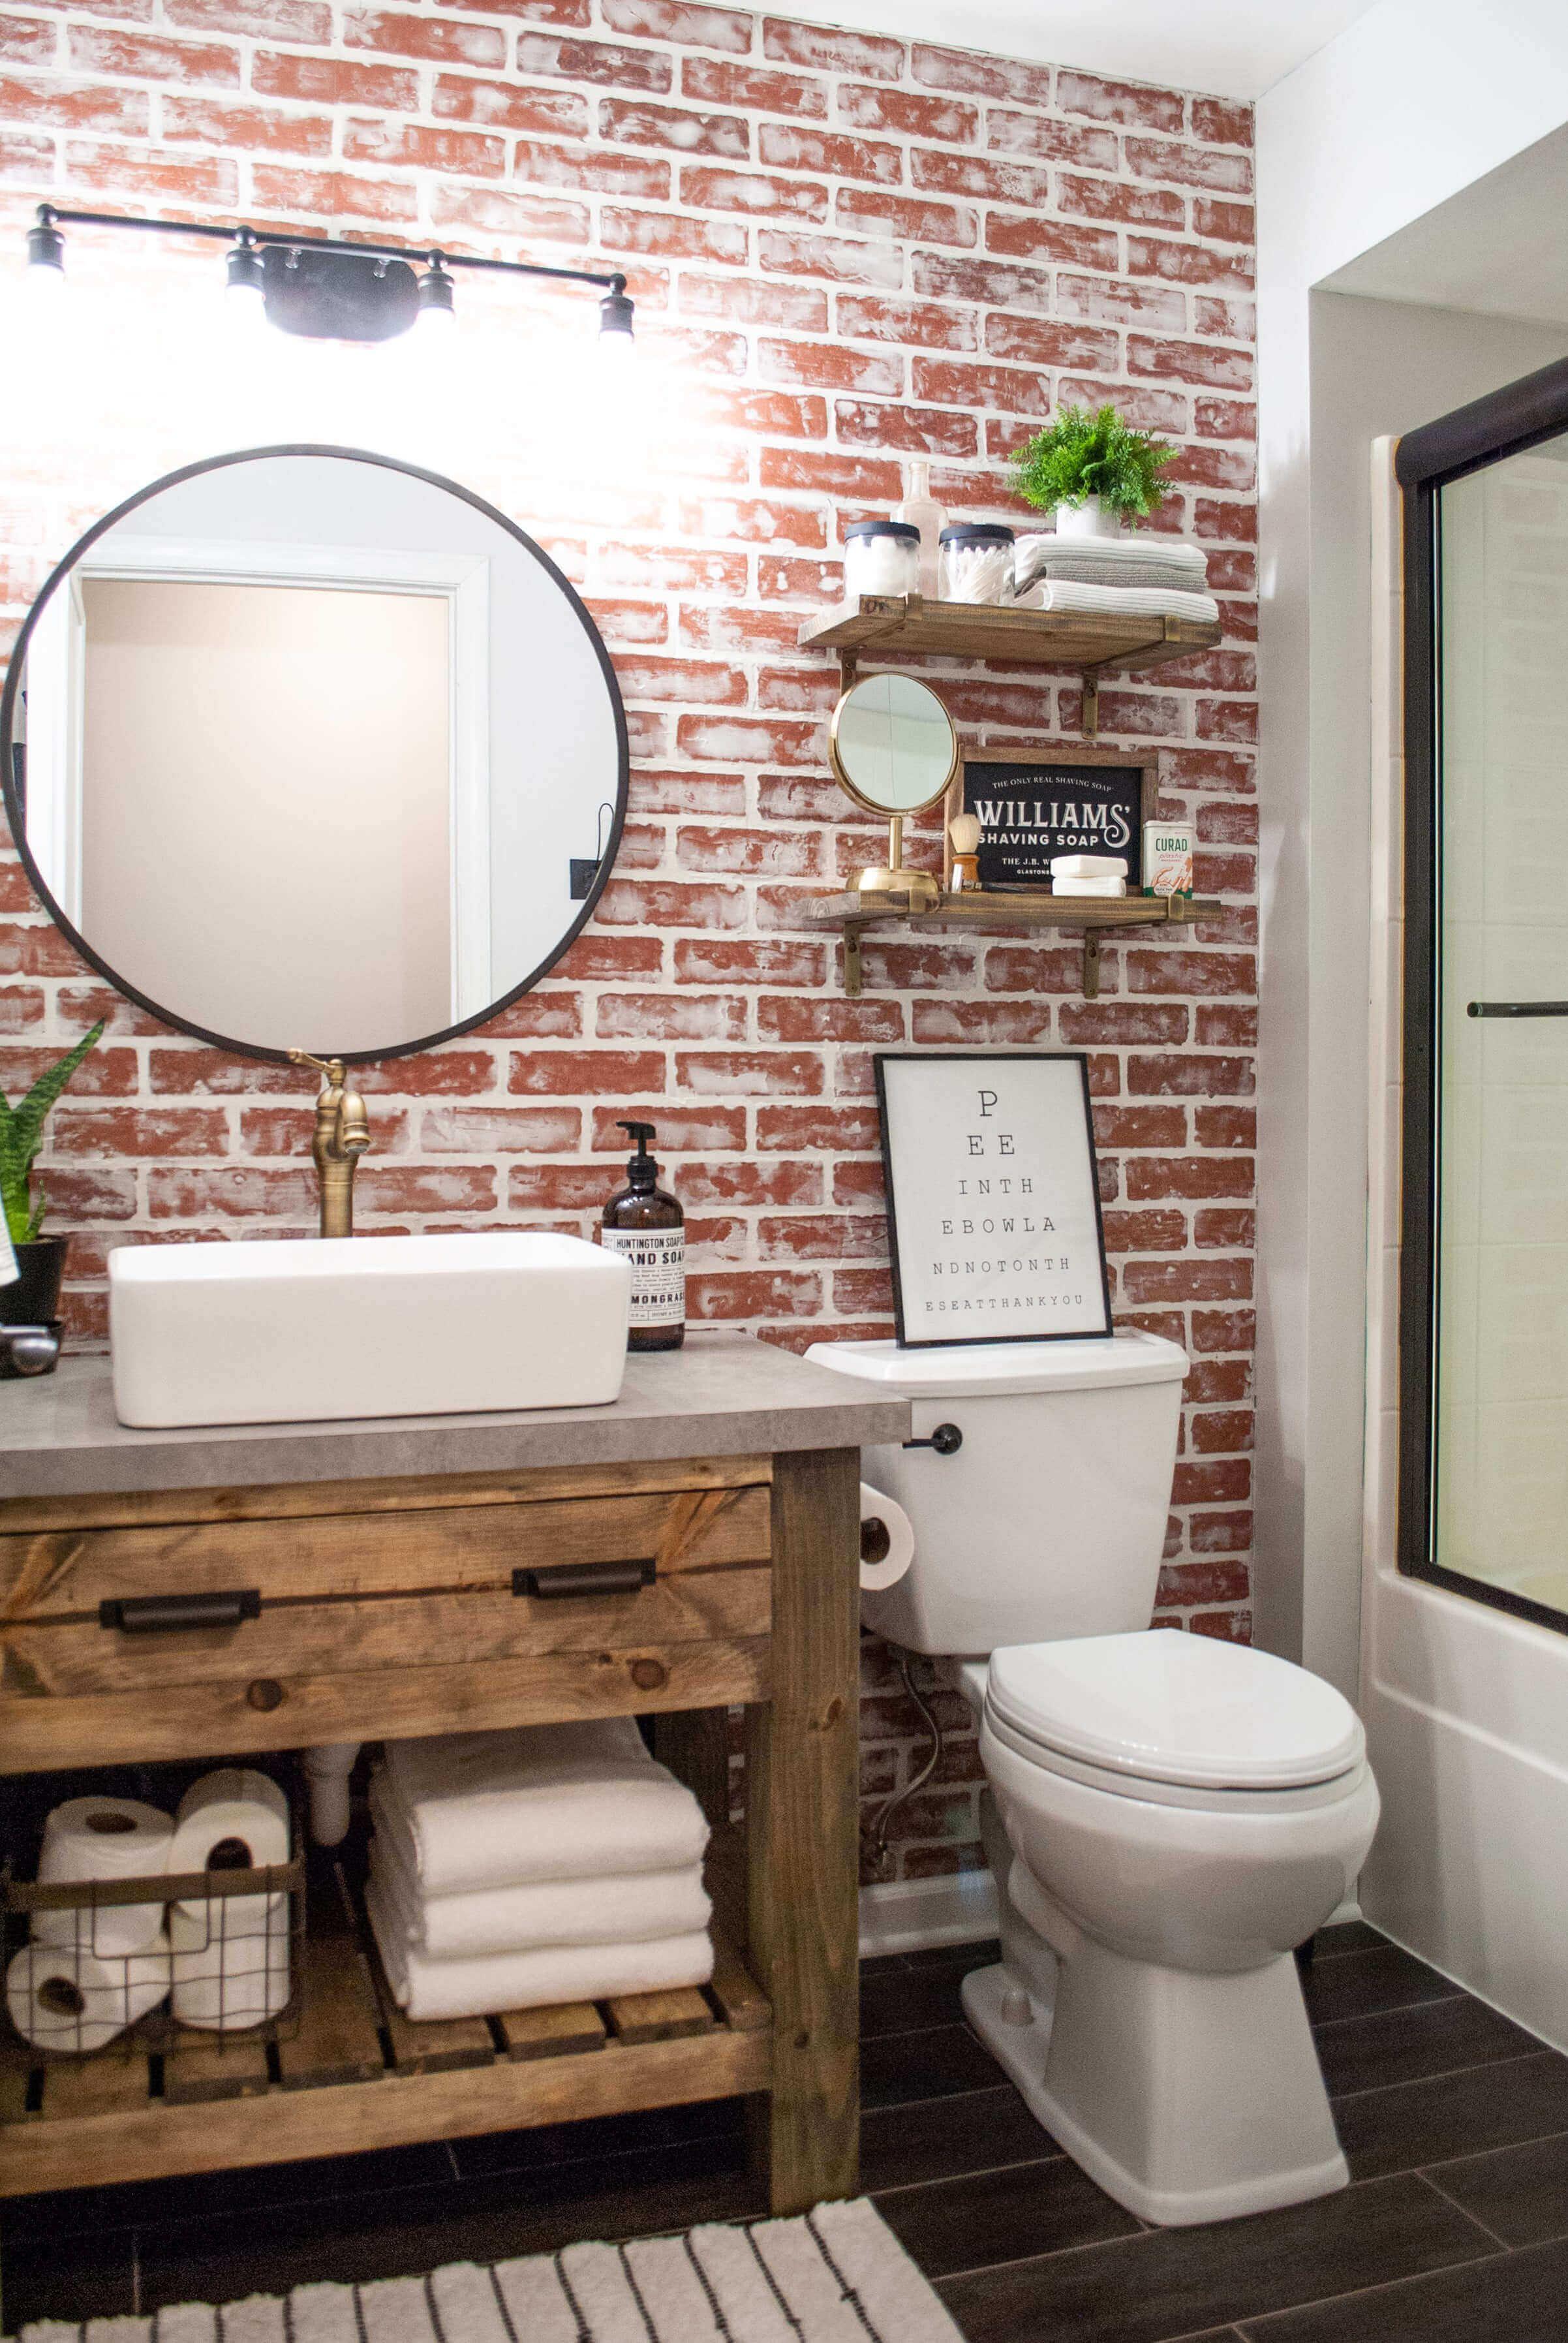 21 Simple Bathroom Wall Decor Ideas Bathroom Wall Decor Remodel Faux Brick Walls Diy Faux Brick Wall Brick Bathroom Bathroom wall decor ideas